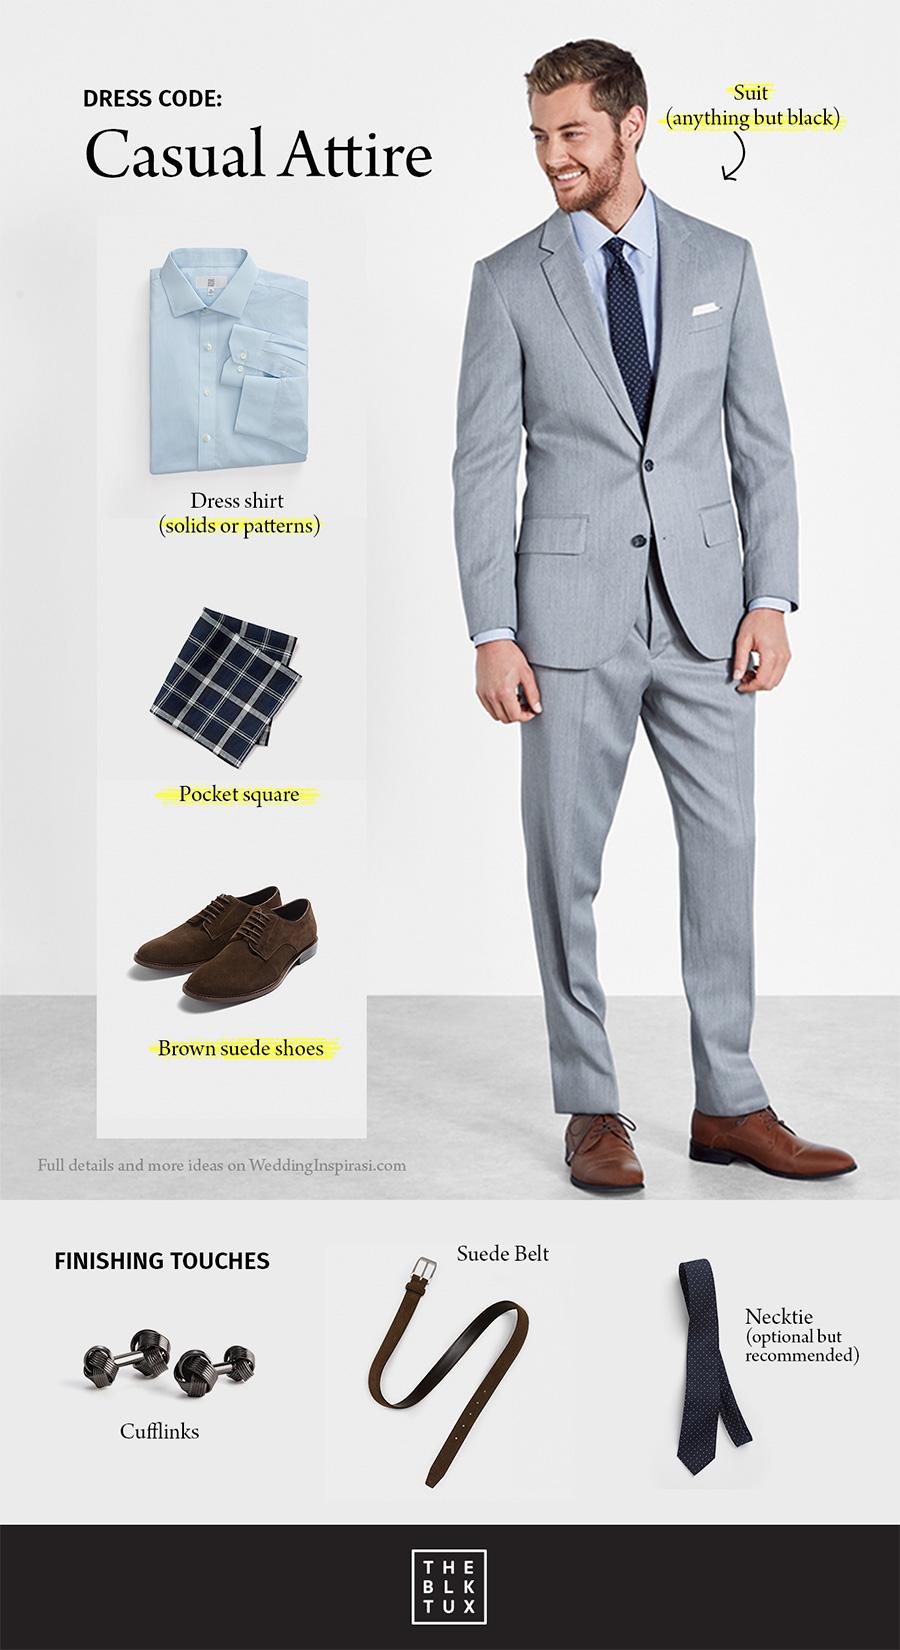 the black tux wedding dress code casual attire modern style suit tuxedo rental service